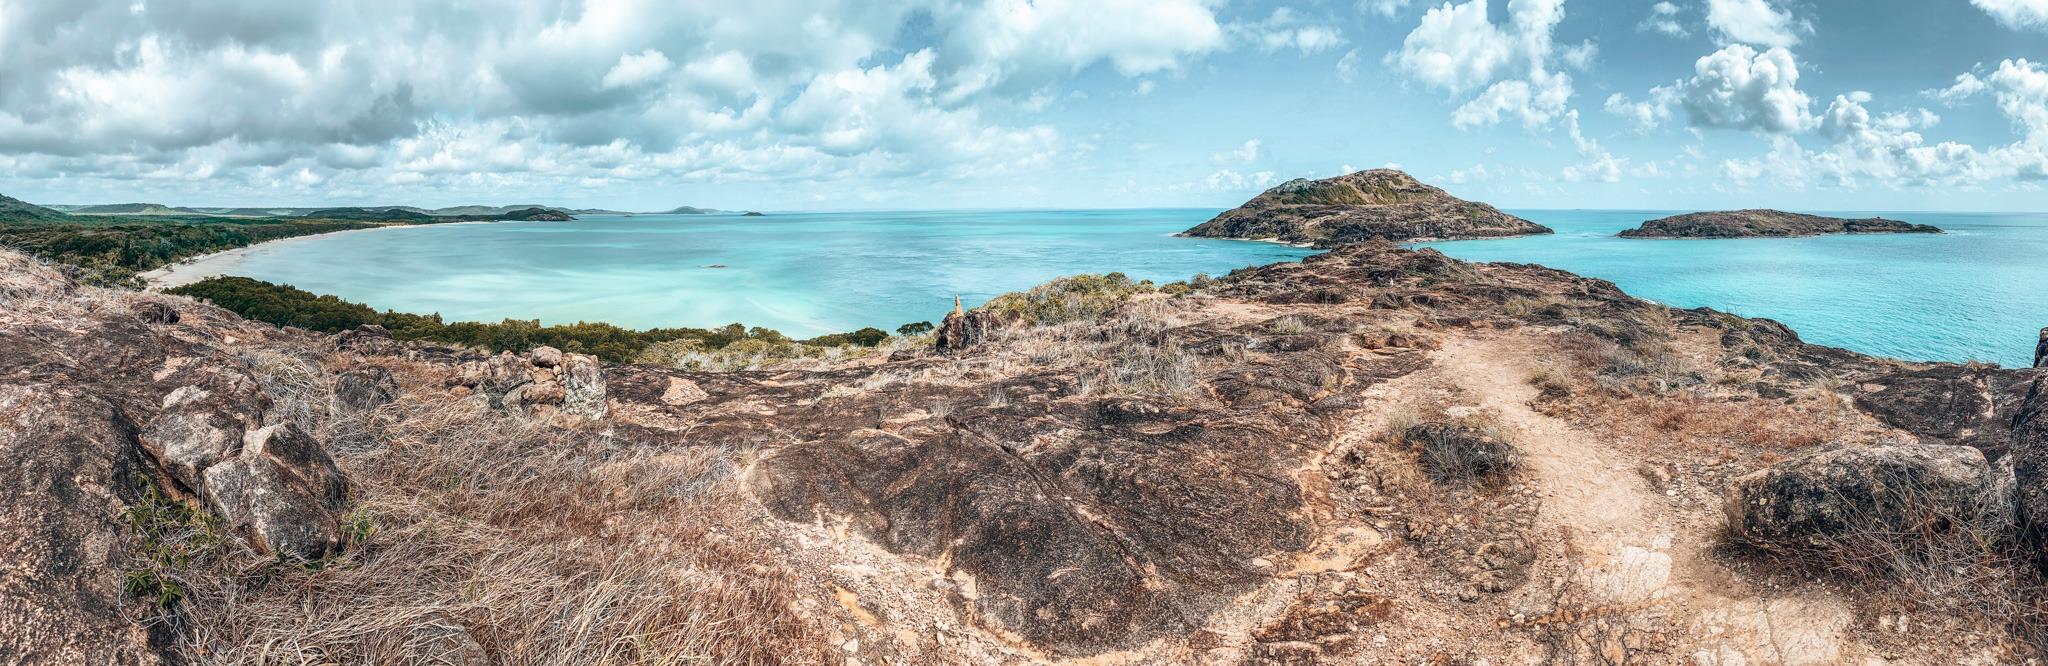 Cape York australie